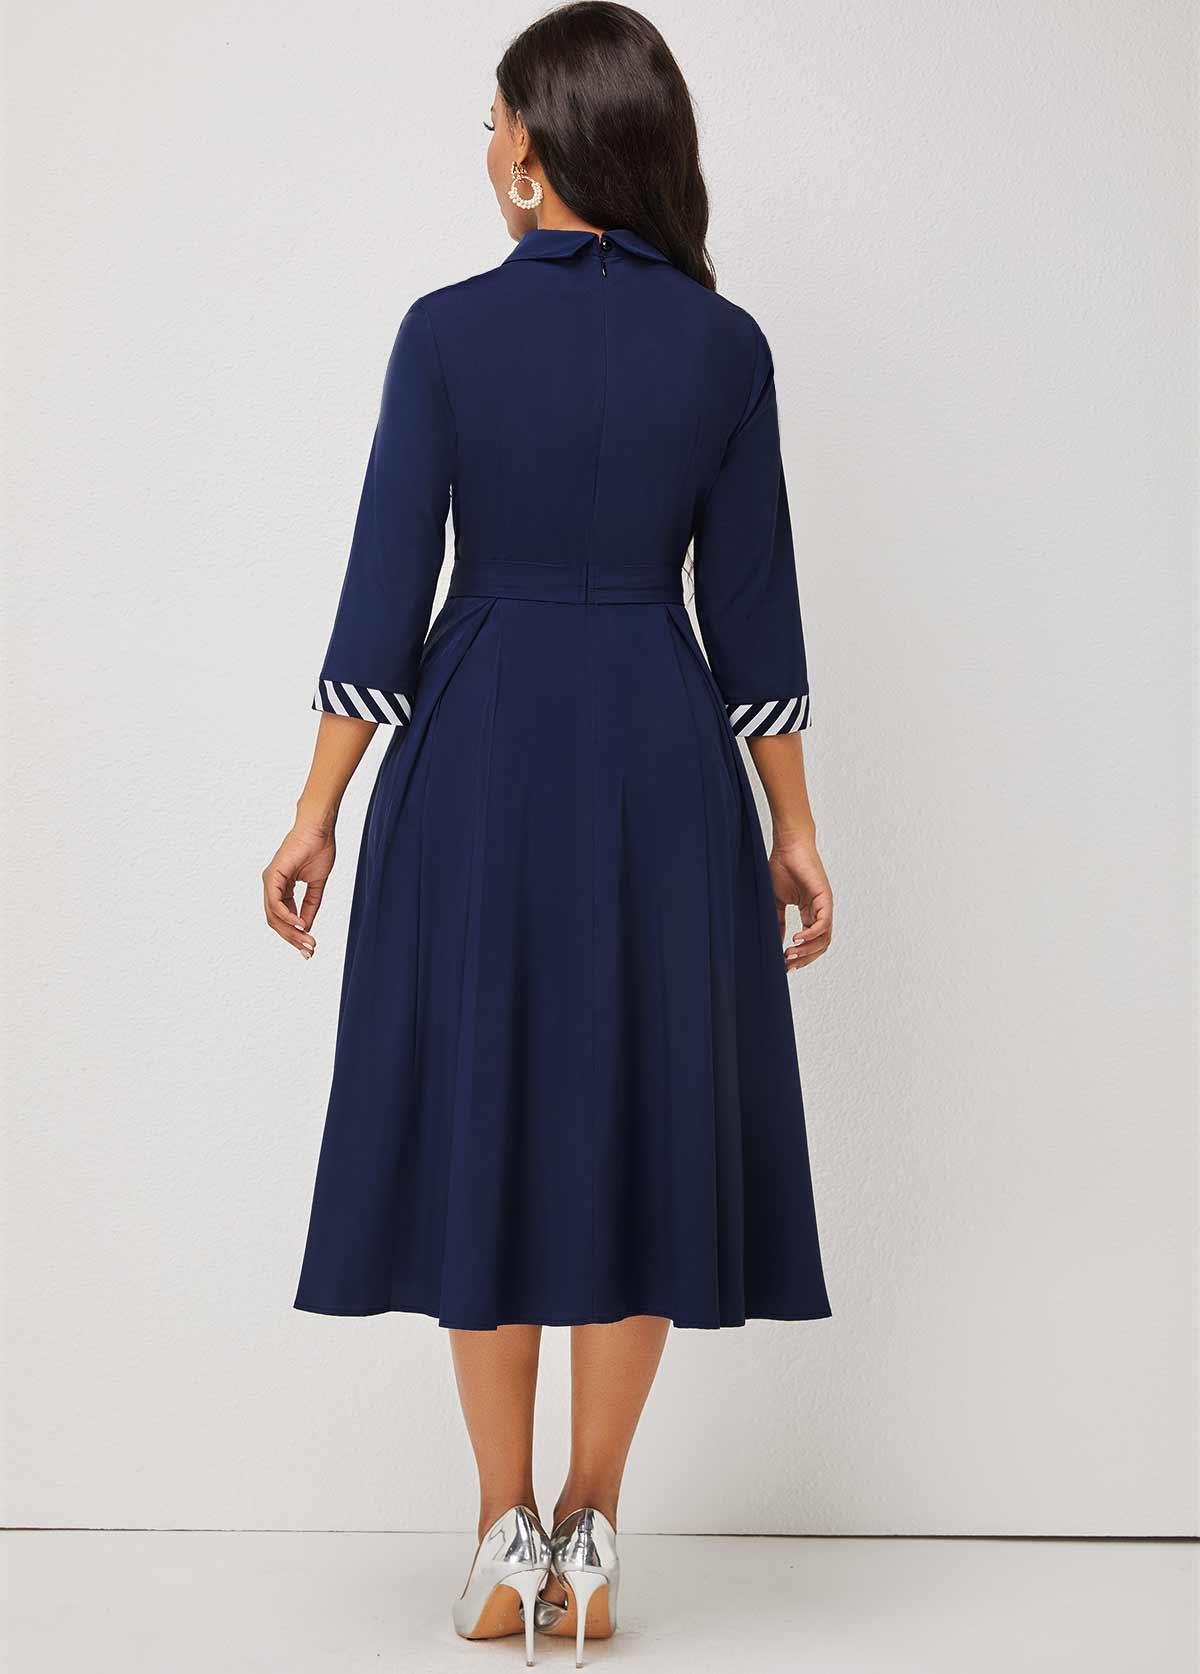 Stripe Print Decorative Button 3/4 Sleeve Turndown Collar Dress